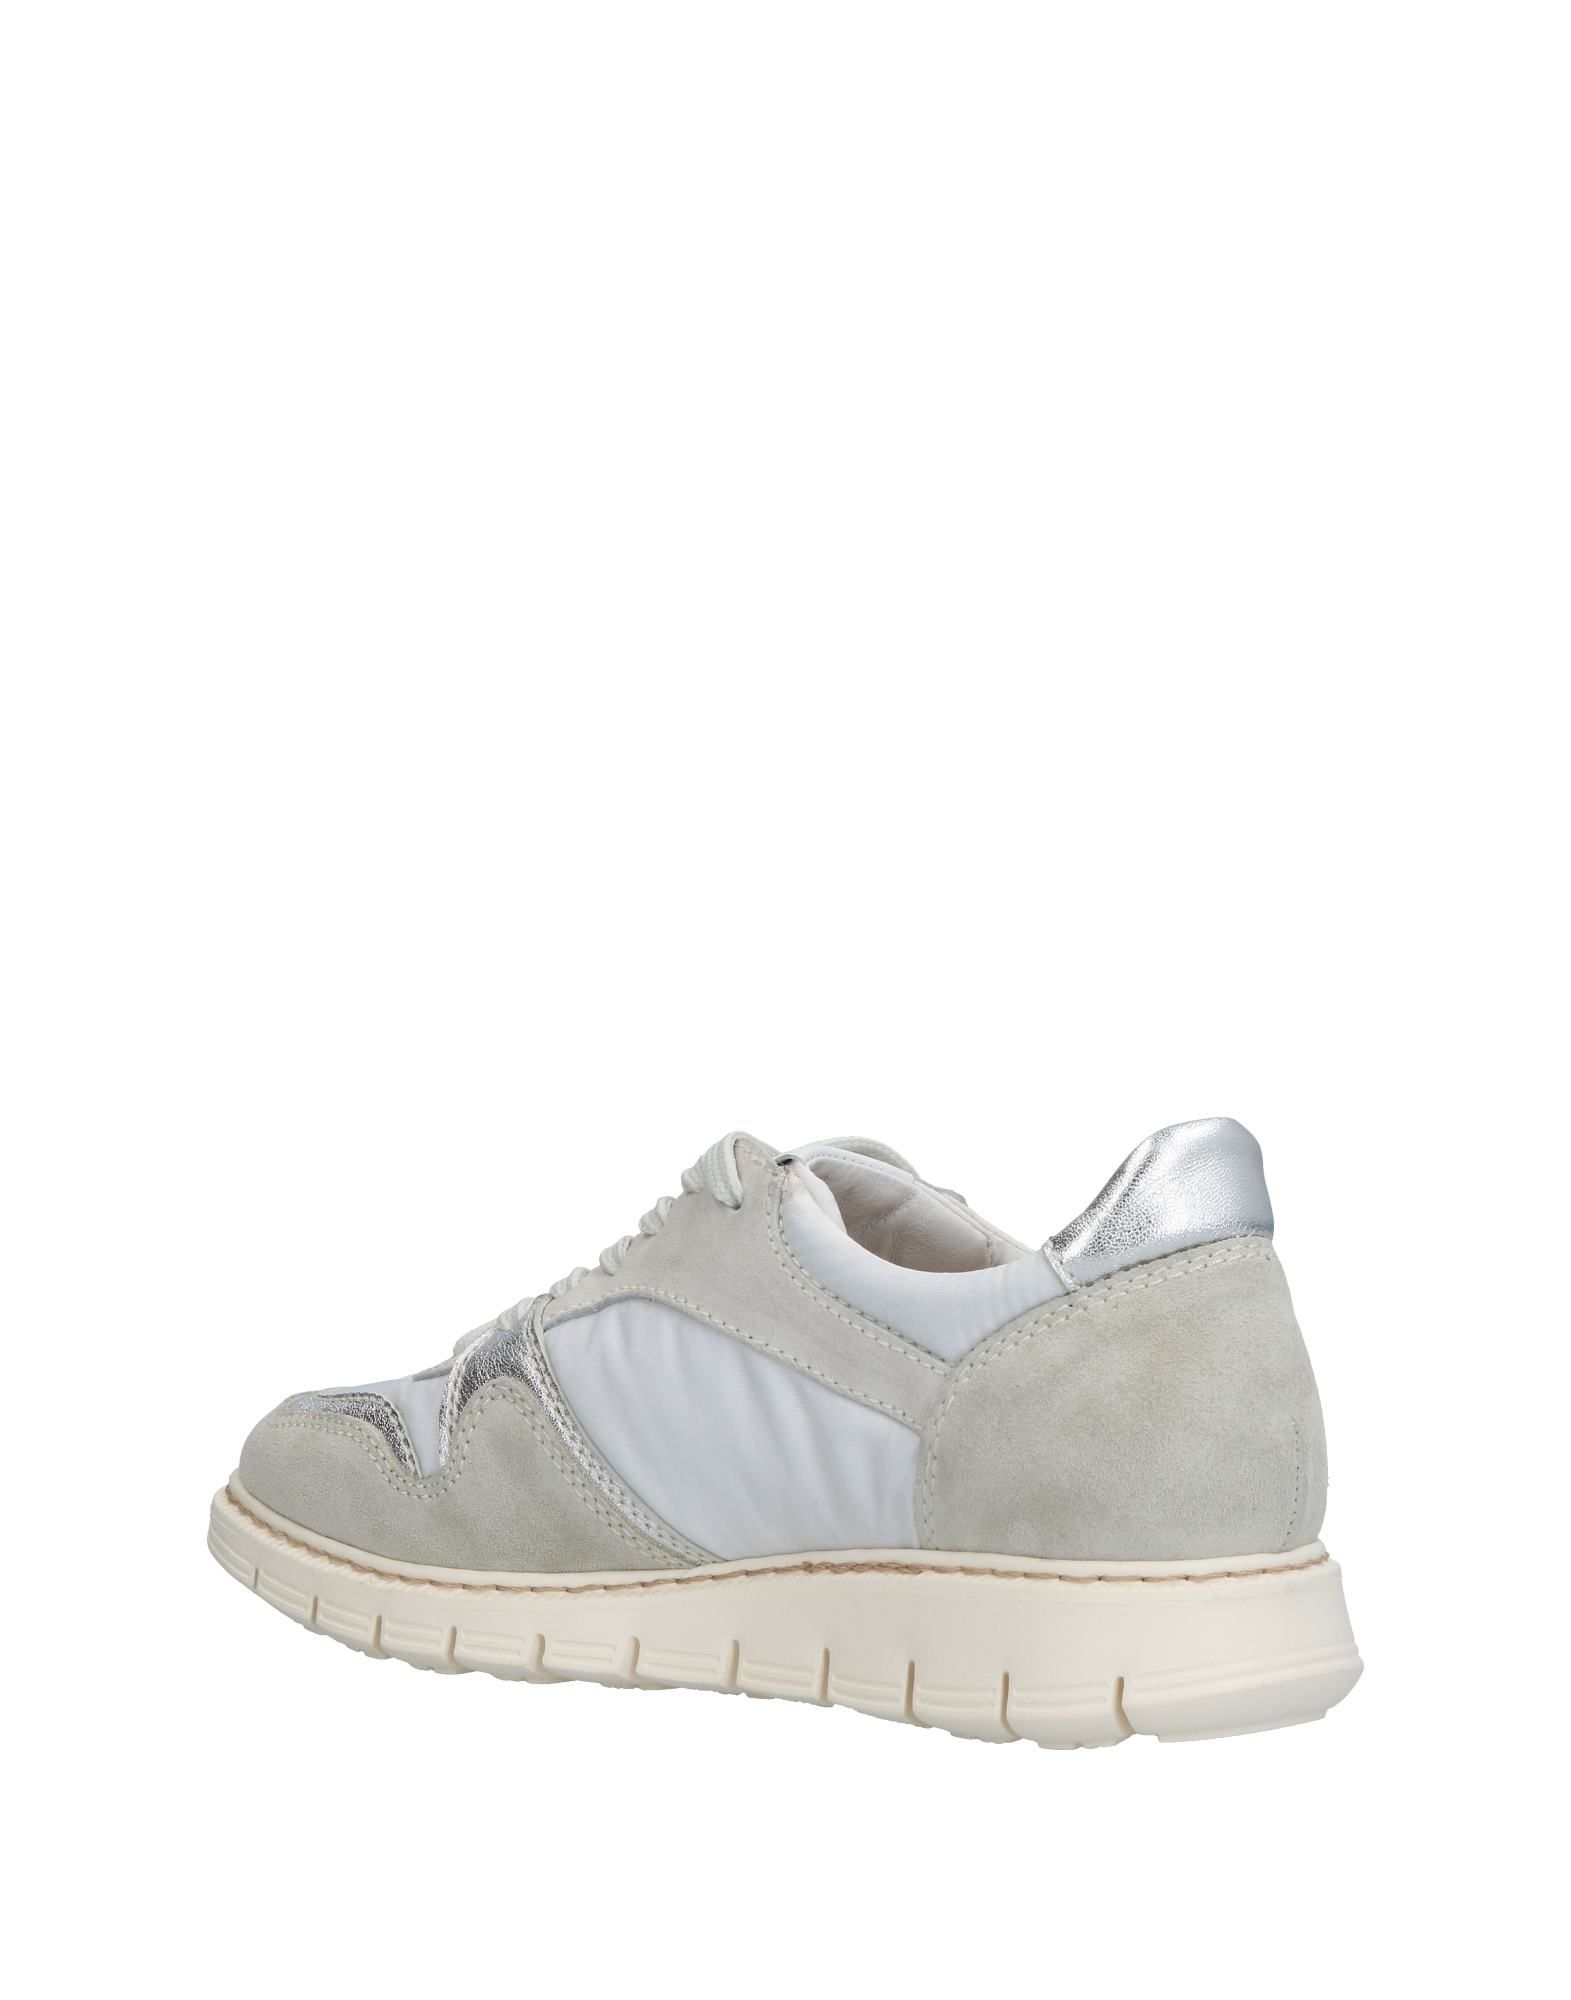 Sneakers Maritan G Femme - Sneakers Maritan G sur